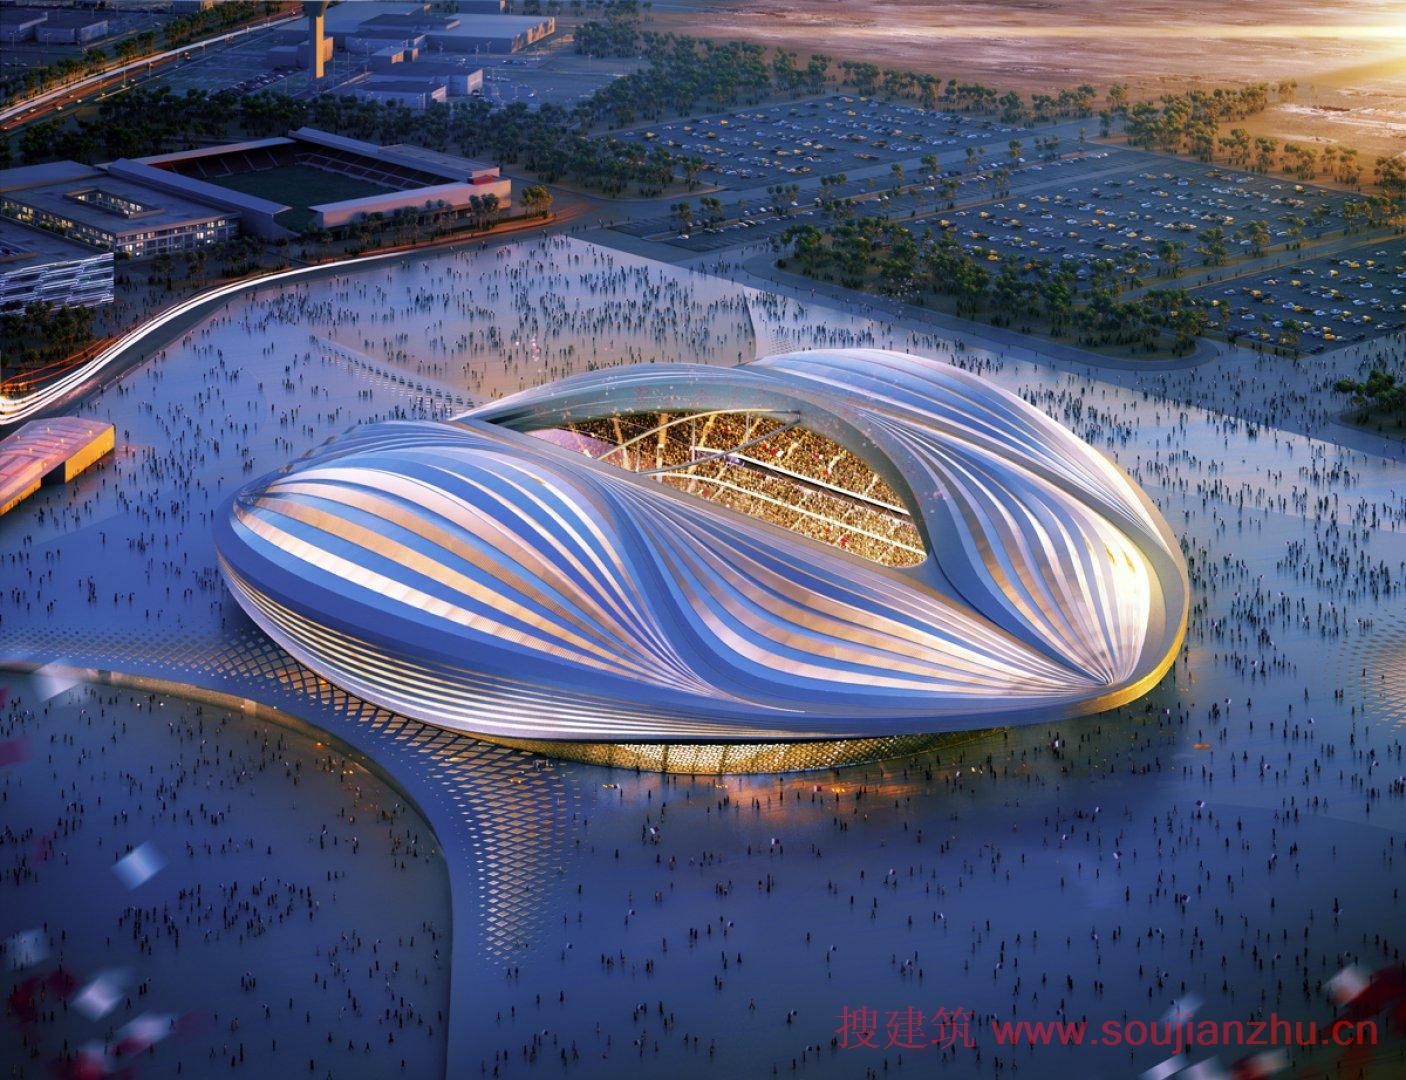 zaha hadid建筑师,联合aecom设计了五个体育场馆